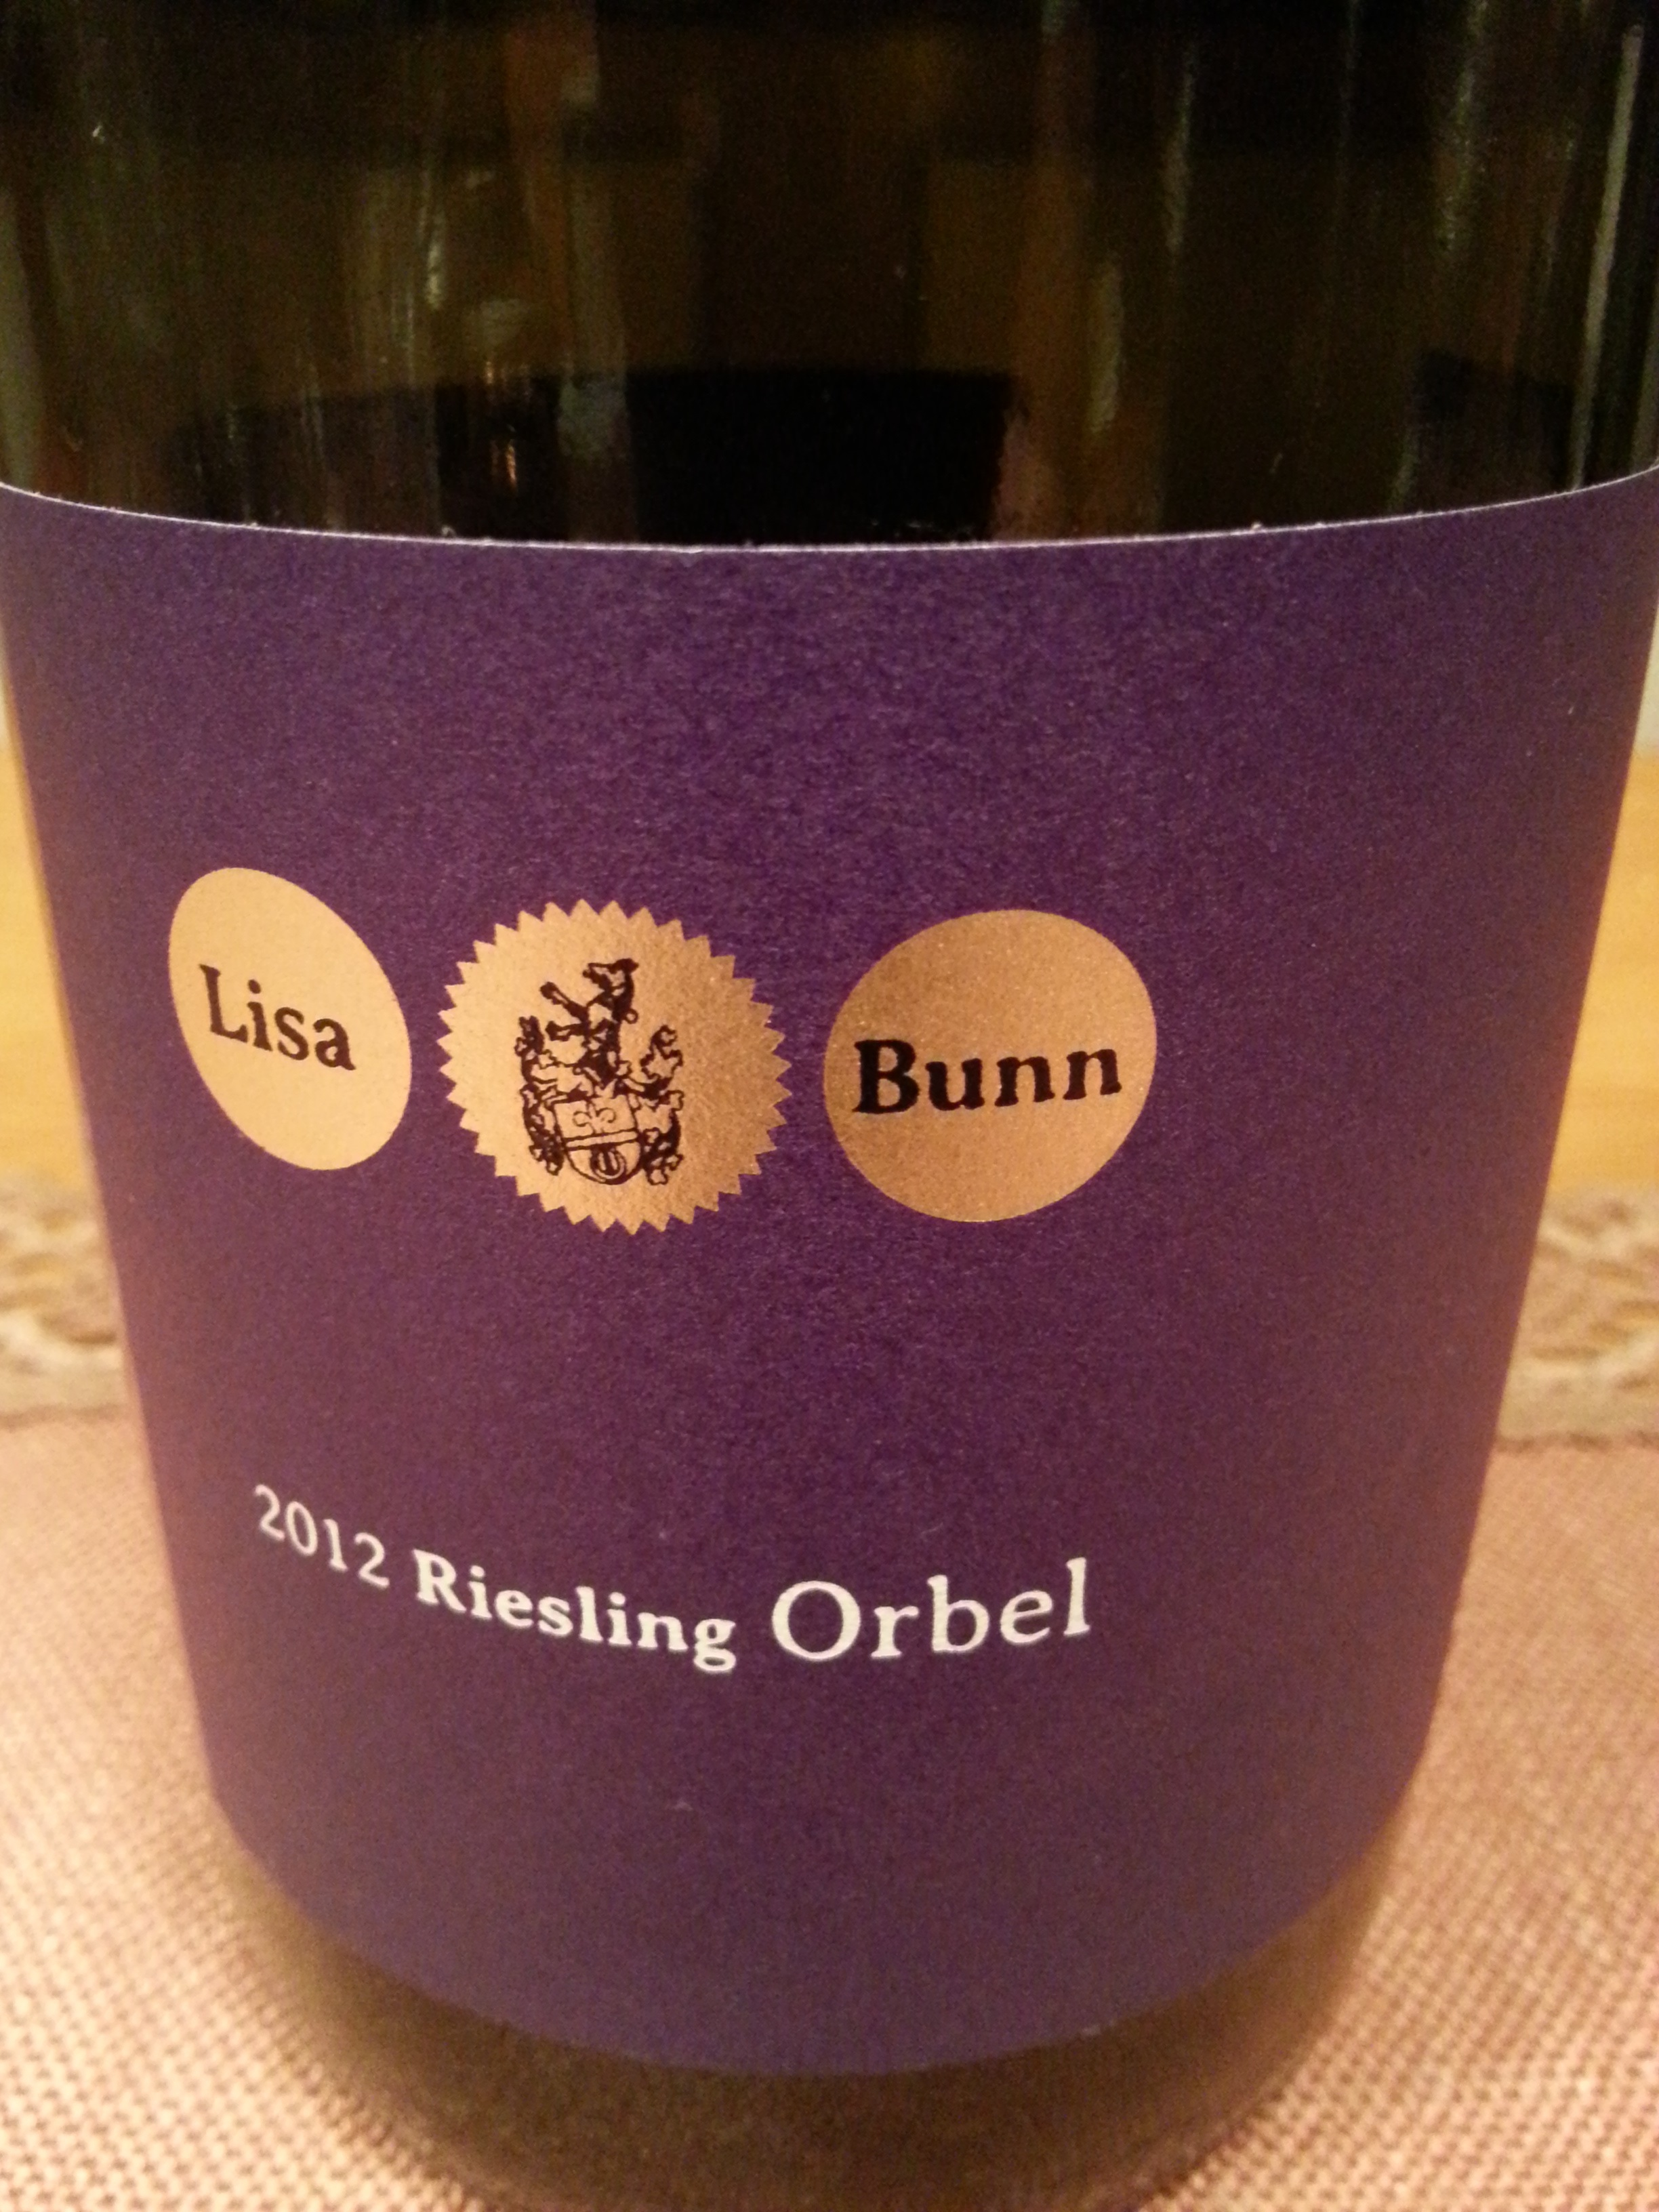 2012 Riesling Orbel | Lisa Bunn